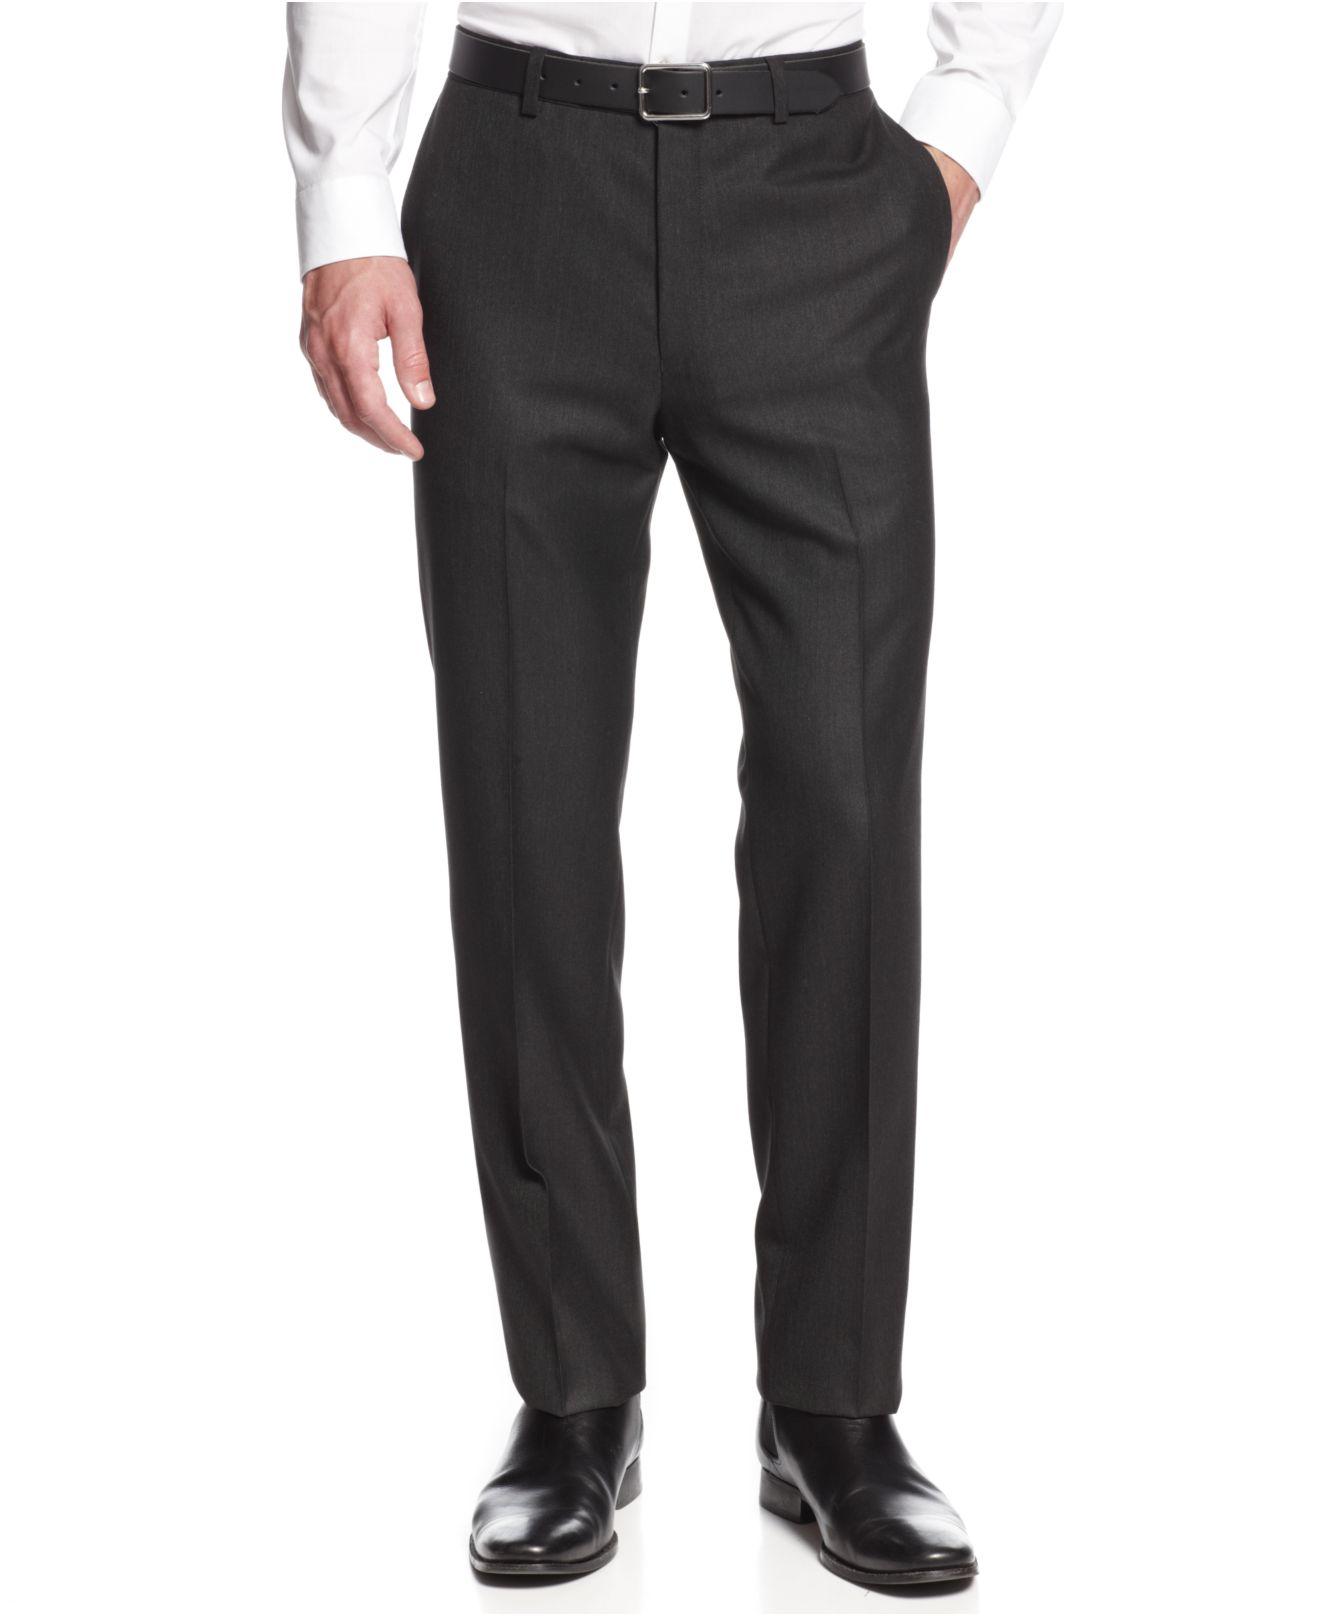 Lyst calvin klein x charcoal pindot slim fit dress pants for Calvin klein x fit dress shirt